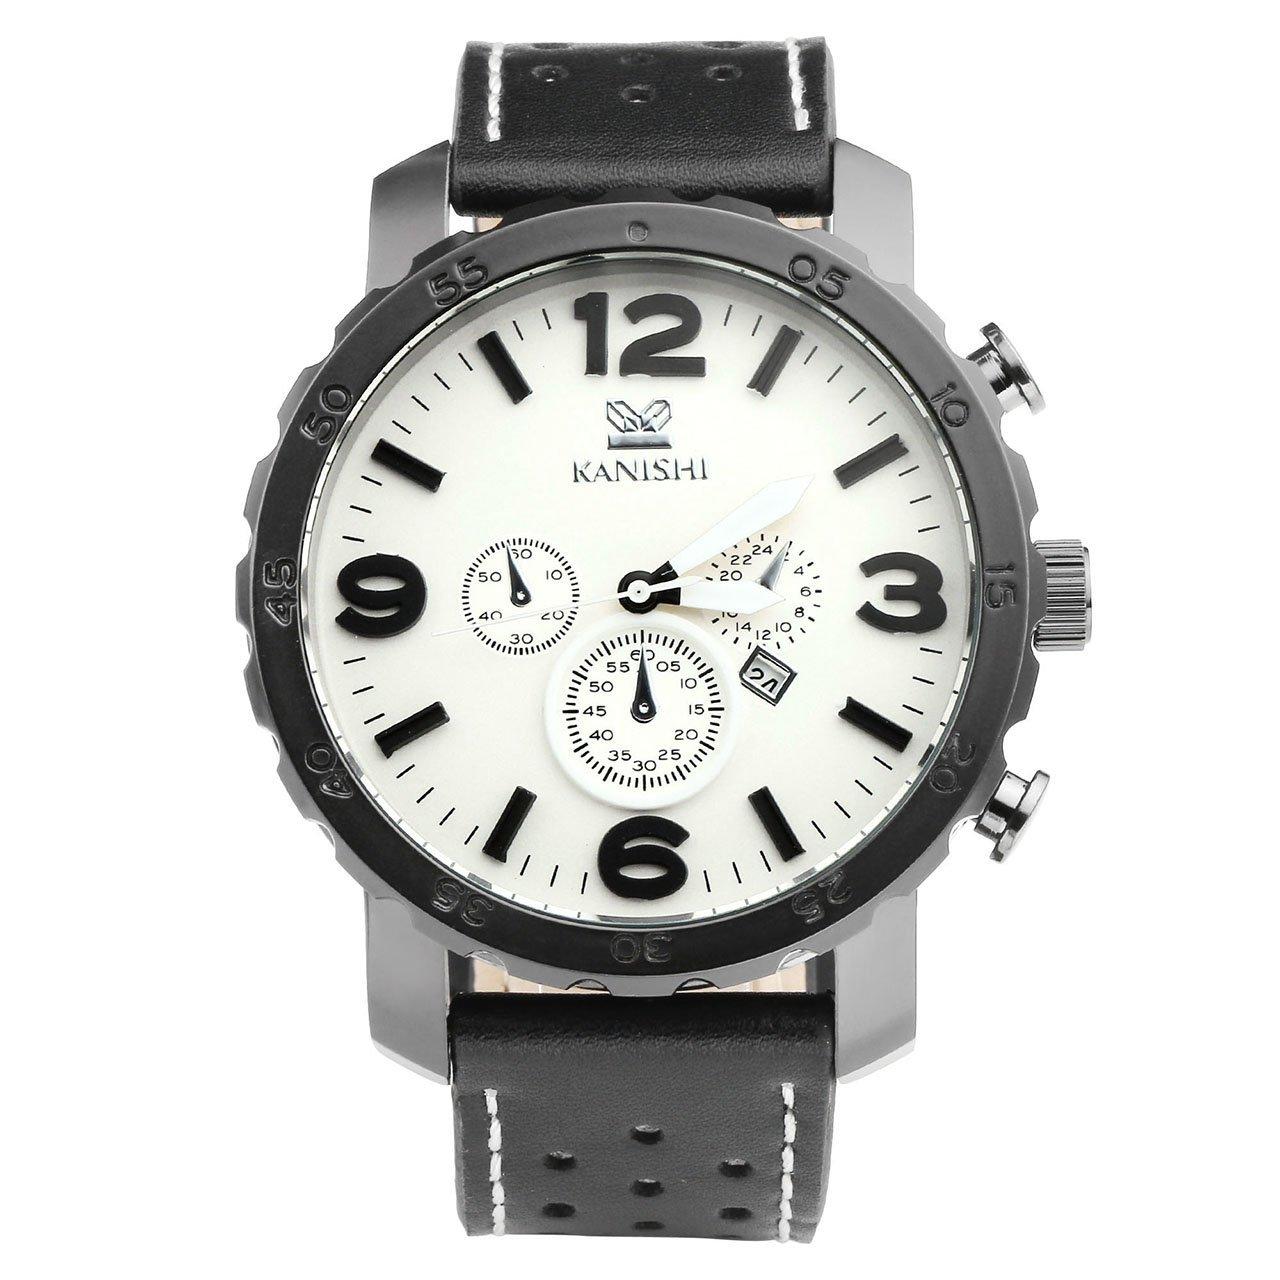 JSDDE Herren-Armbanduhr XL Uhren Herren Echtleder Band Kalenderuhr Traveler unecht Chronograph Analog Quarzuhr,Schwarz/Weiss